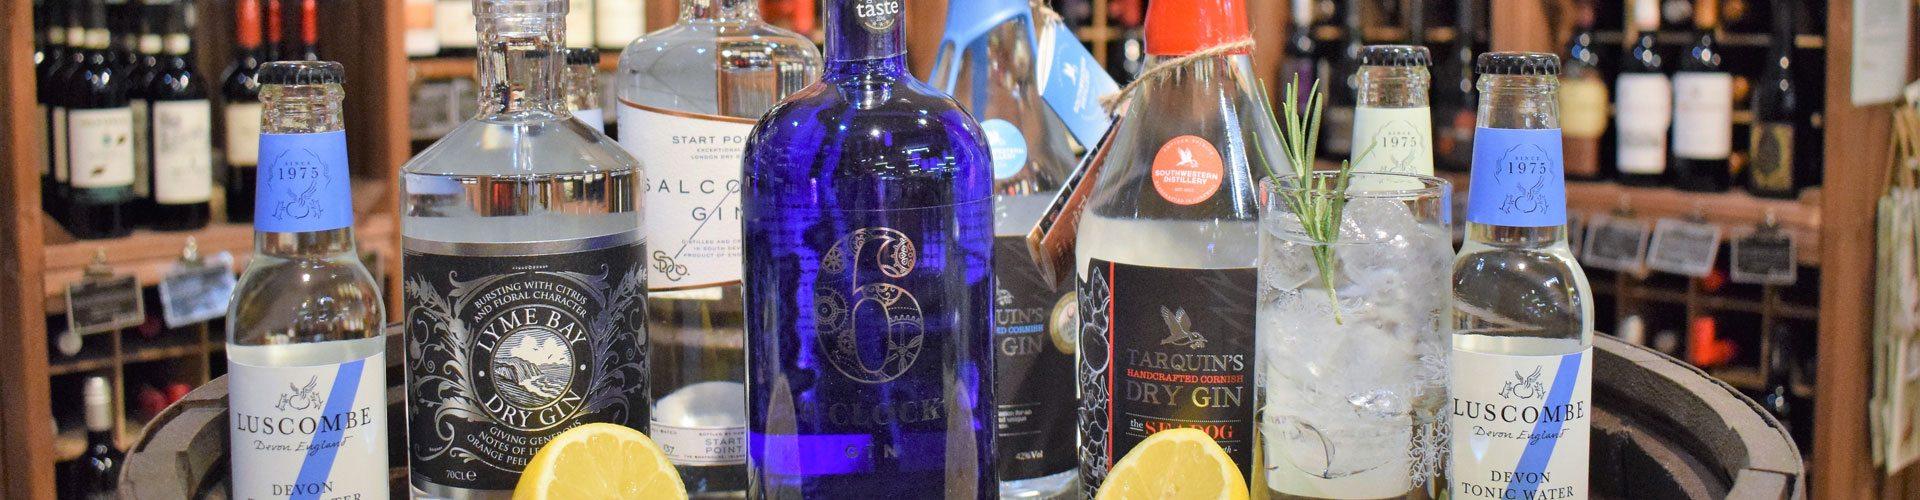 Rumwell Farm Shop & Cafe Gin Tasting Event